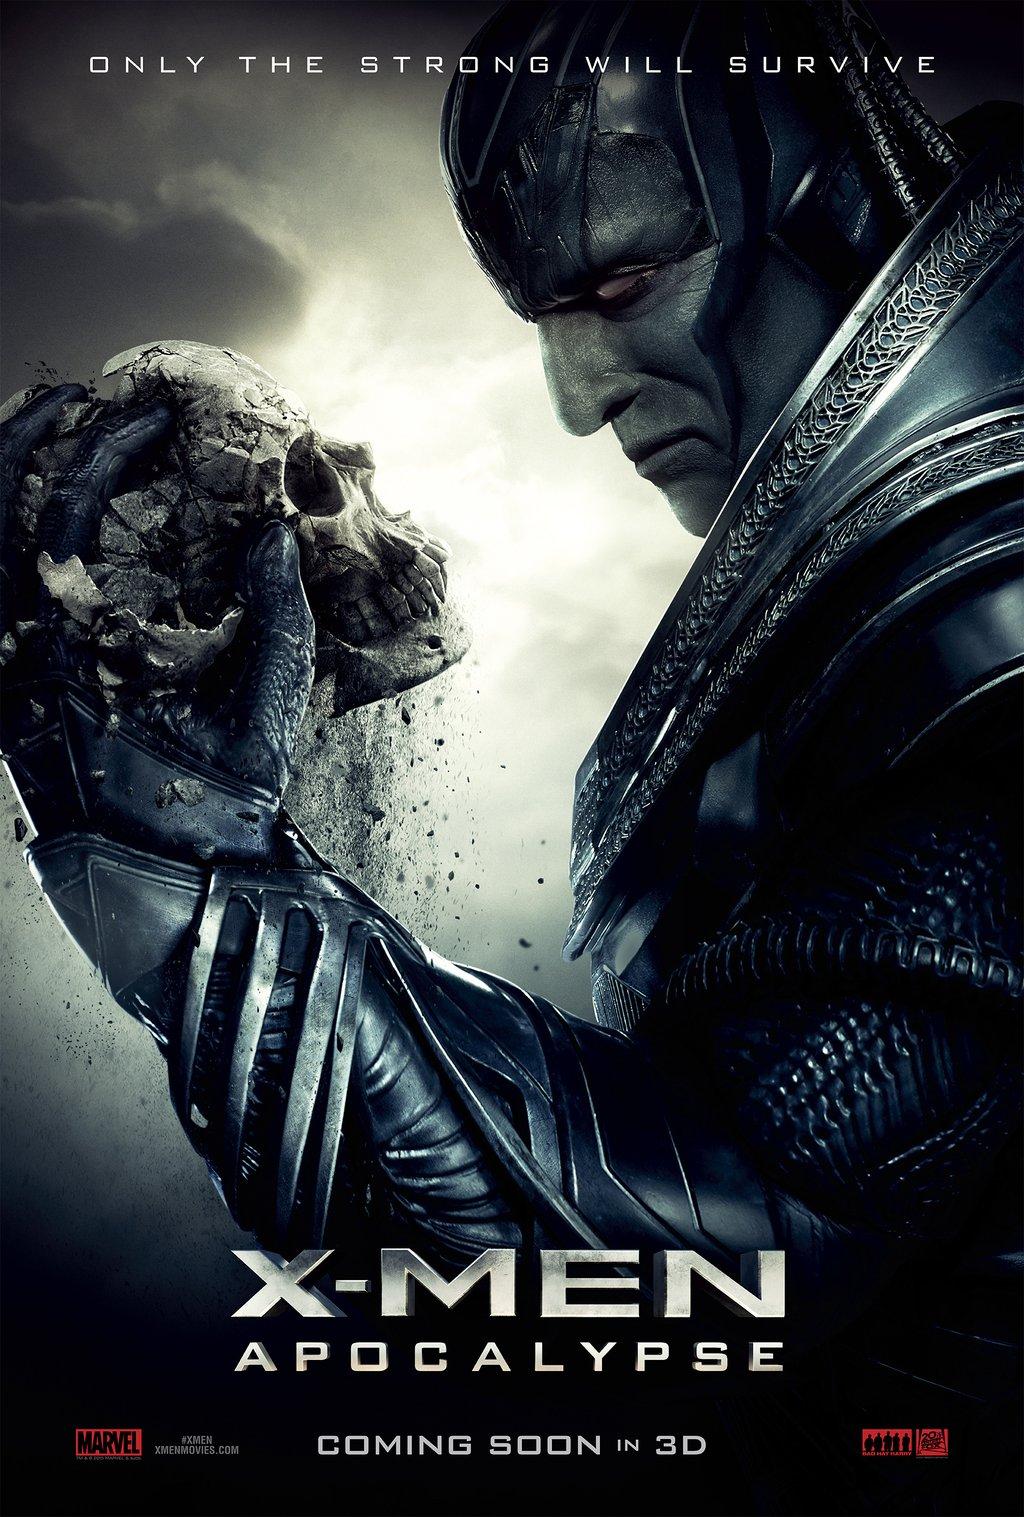 One last final X-Men Apocalypse trailer - meh